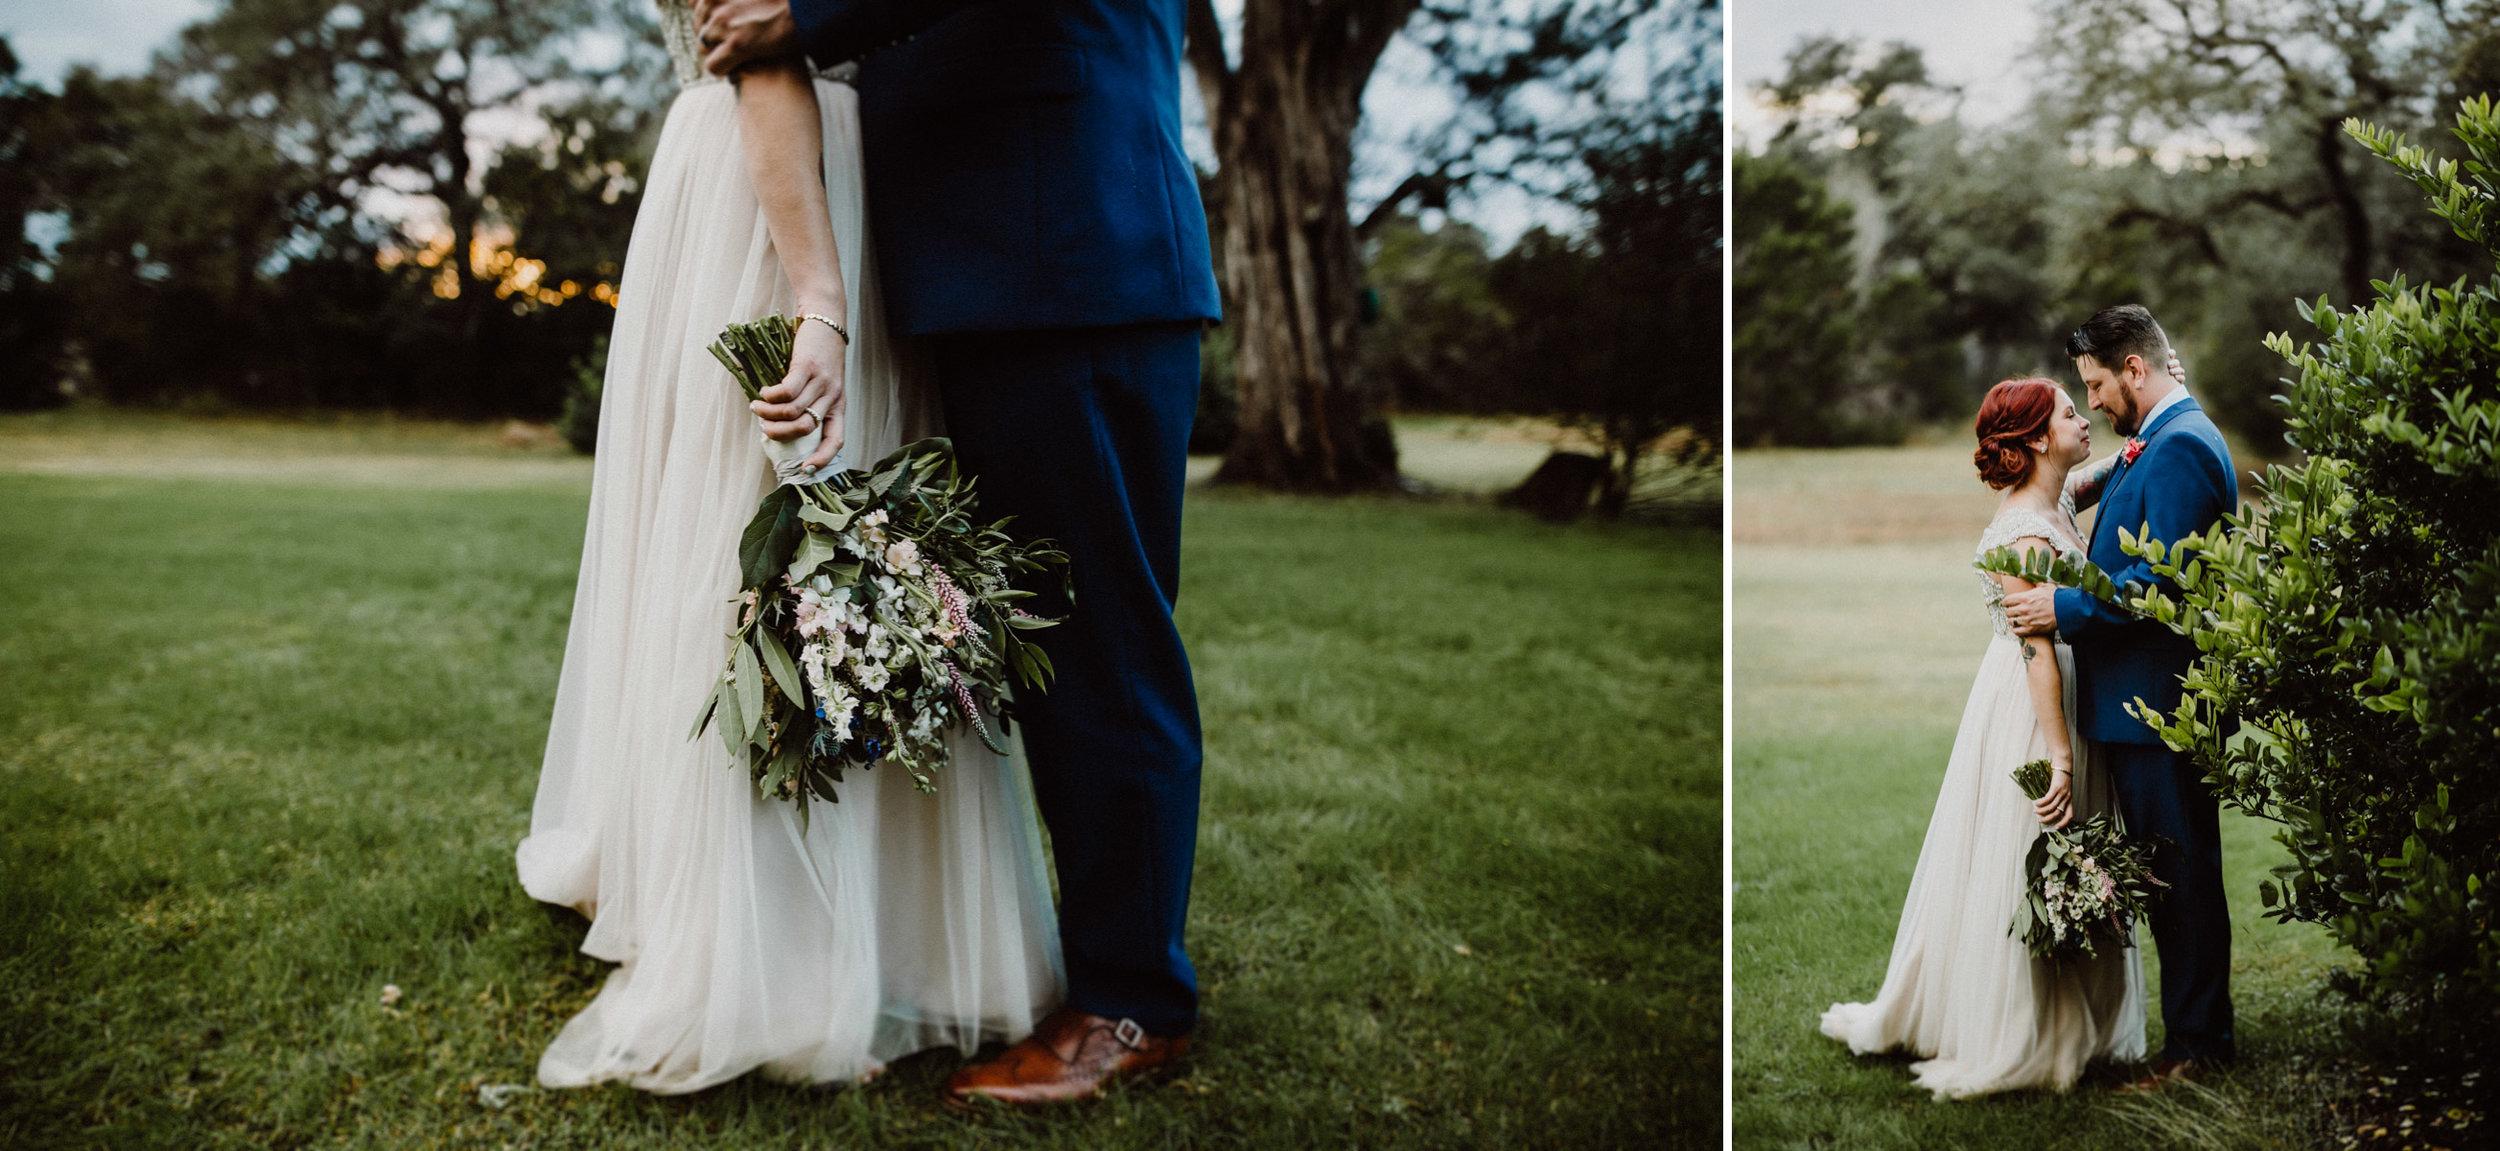 wildflower-barn-wedding-5.jpg